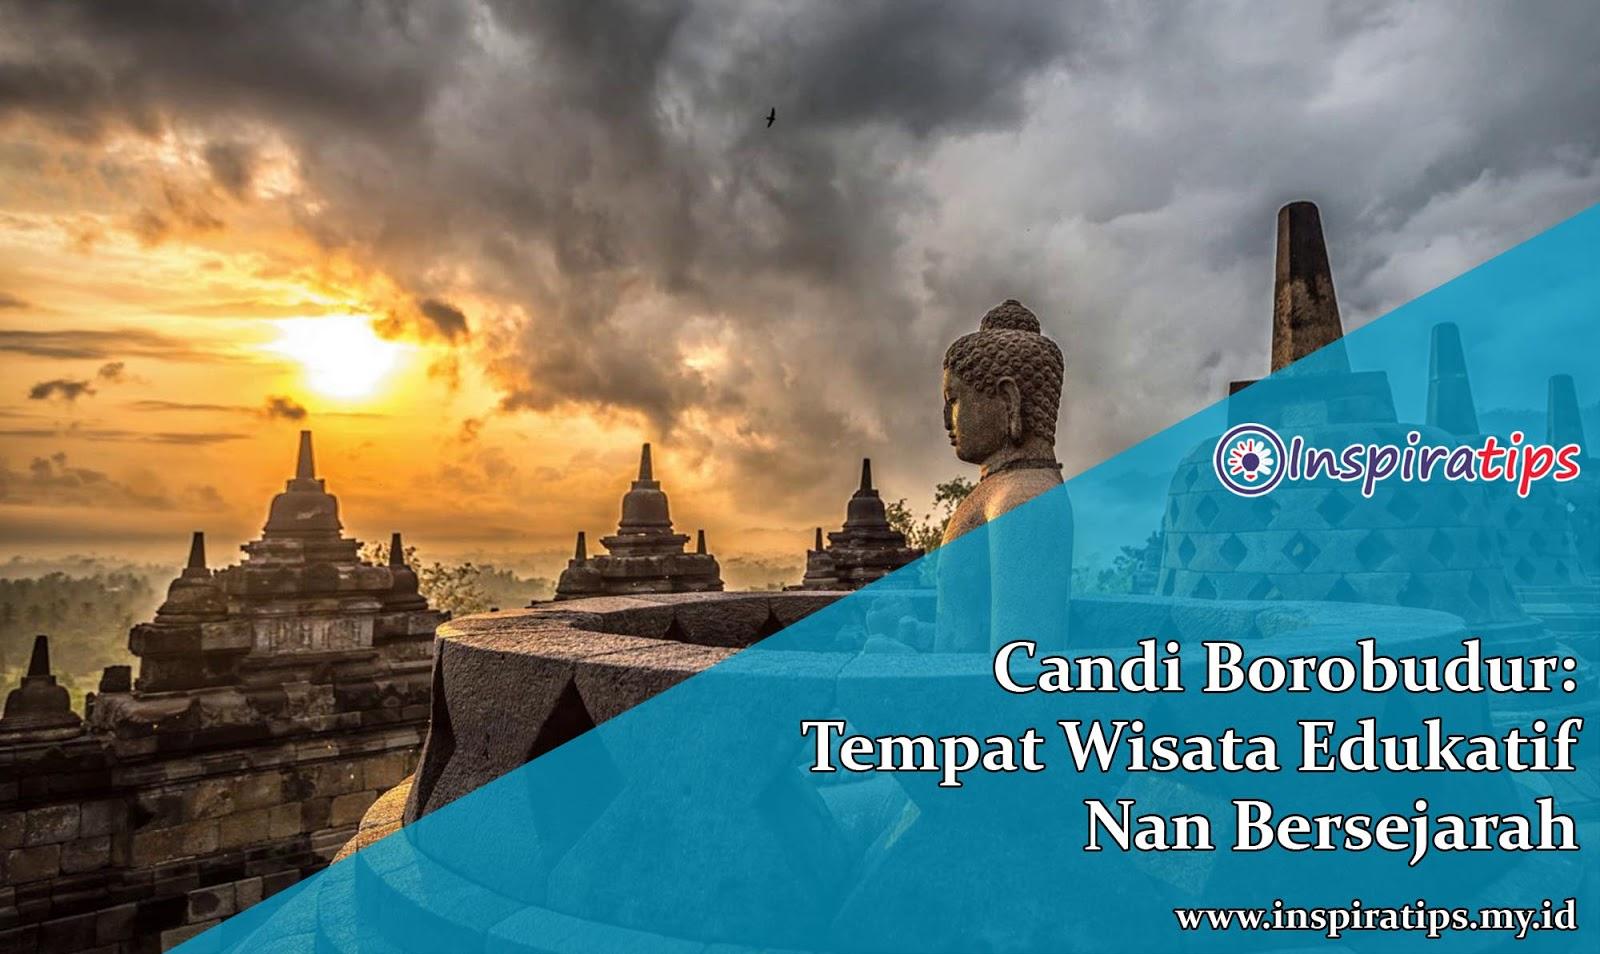 Candi Borobudur Wisata Edukatif